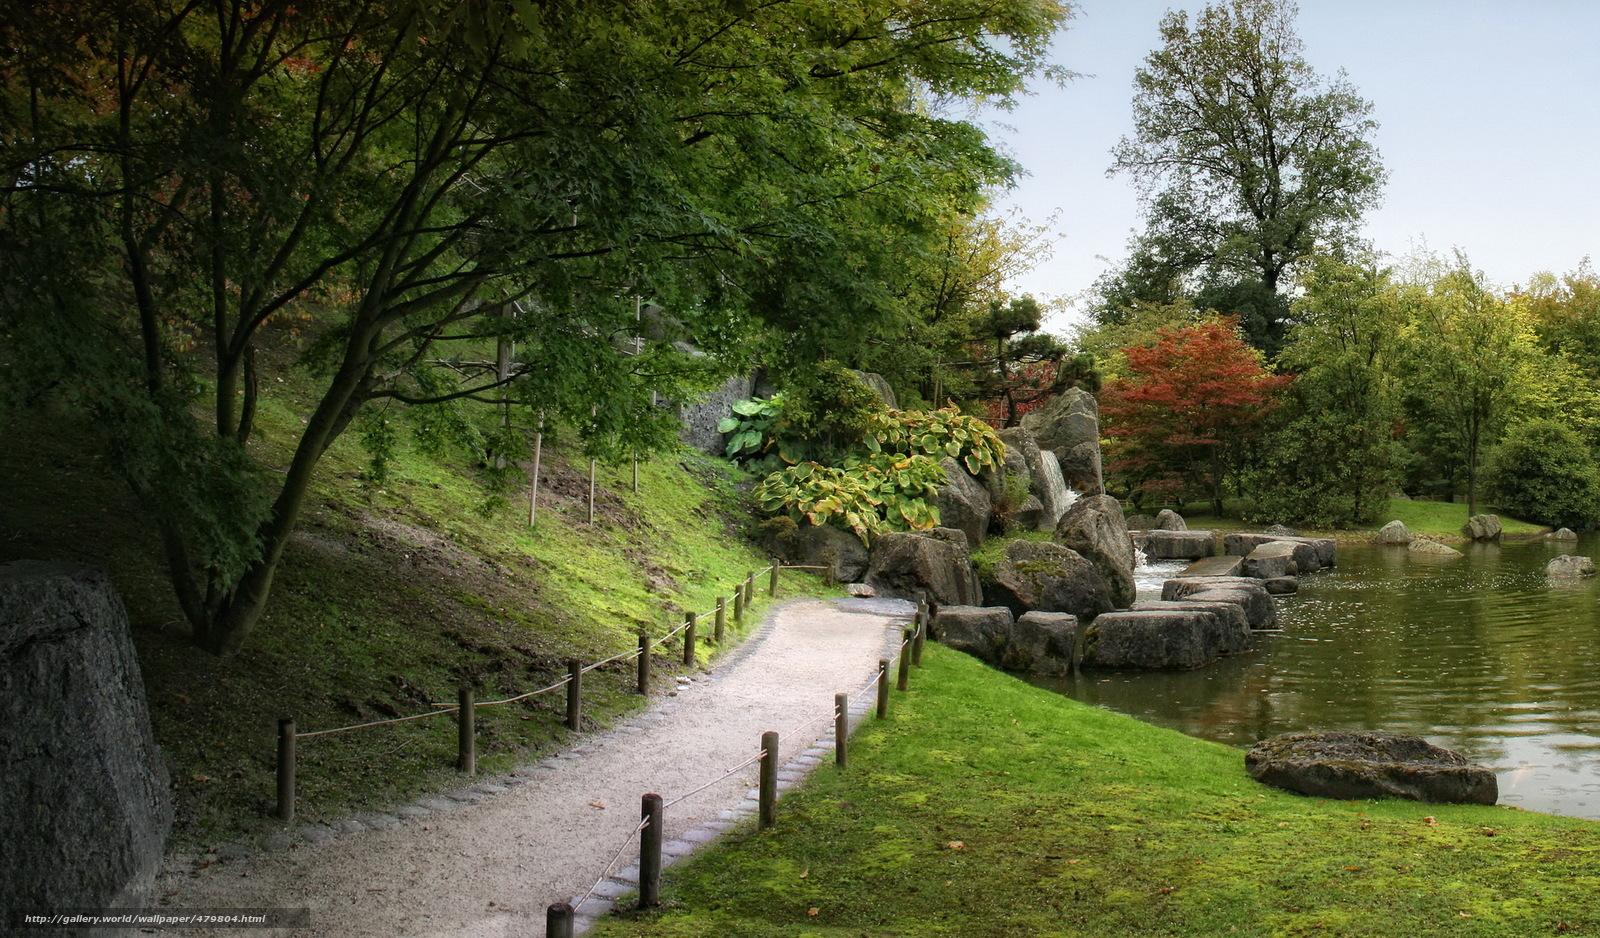 Tlcharger Fond D 39 Ecran Jardins Belgique Japanese Hasselt